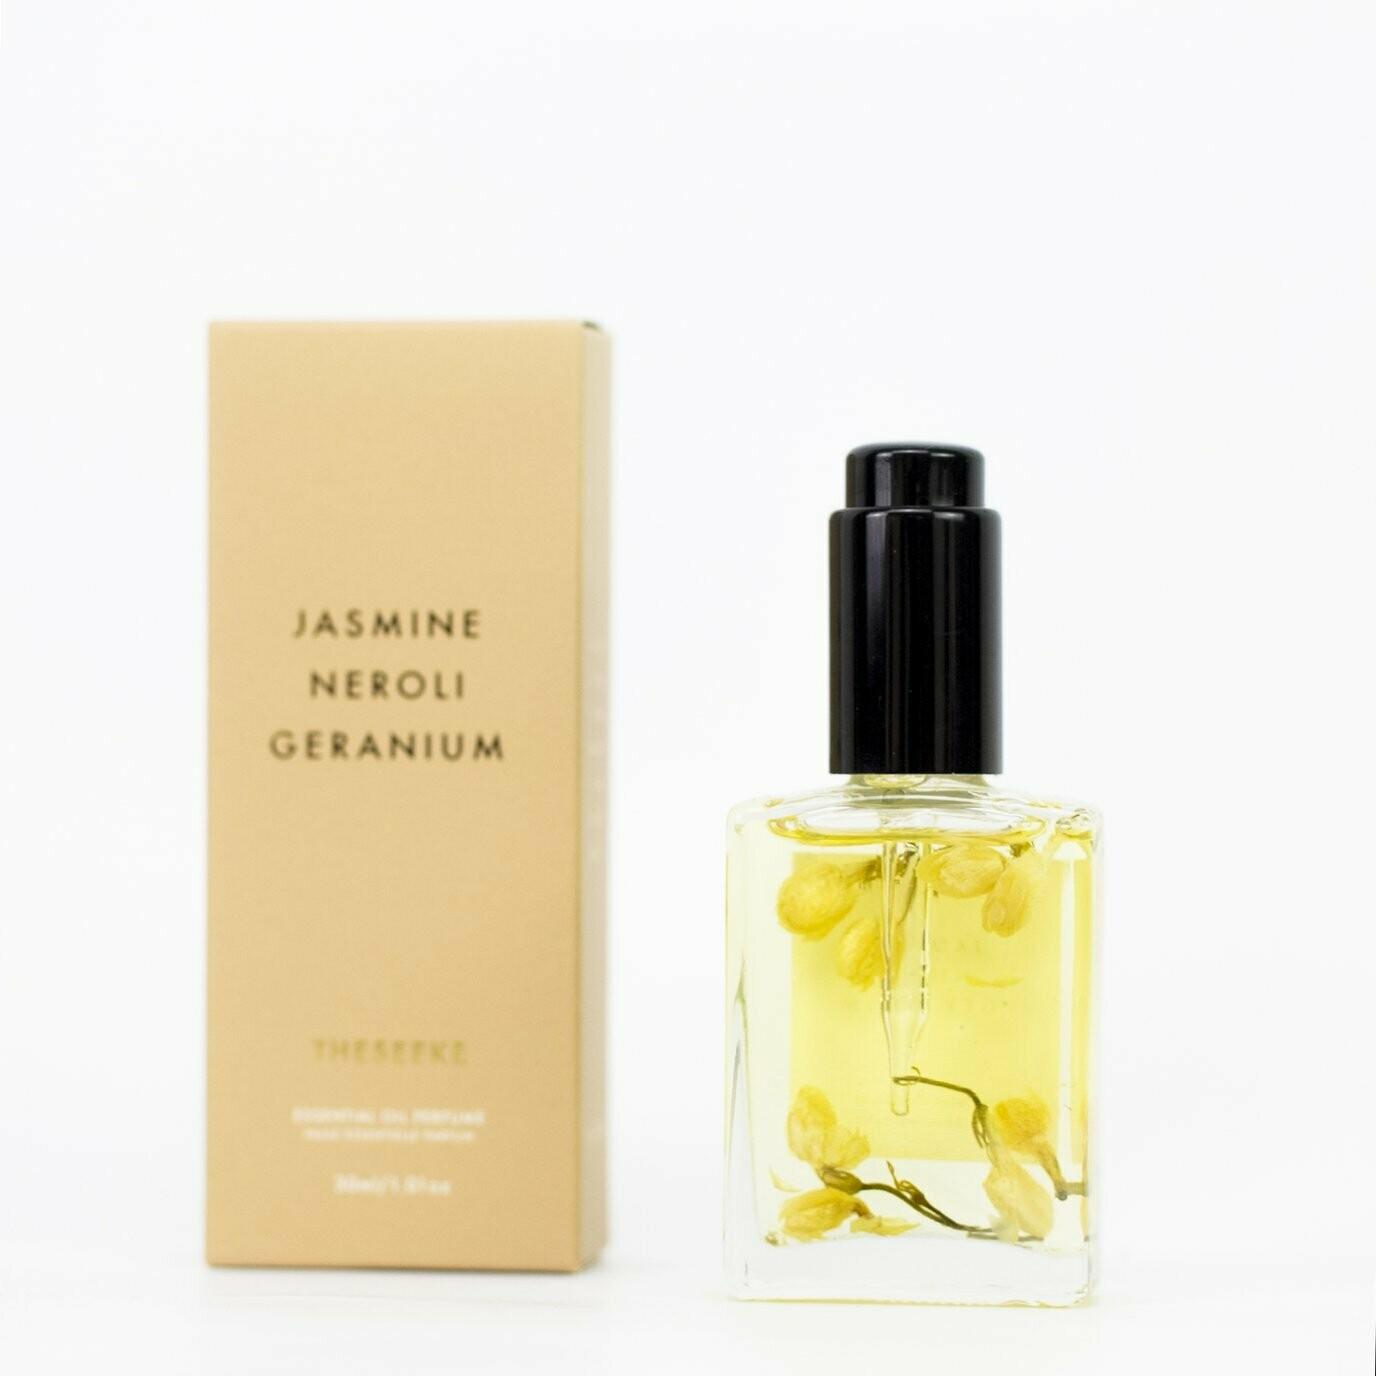 Theseeke - Jasmine, Neroli & Geranium Perfume